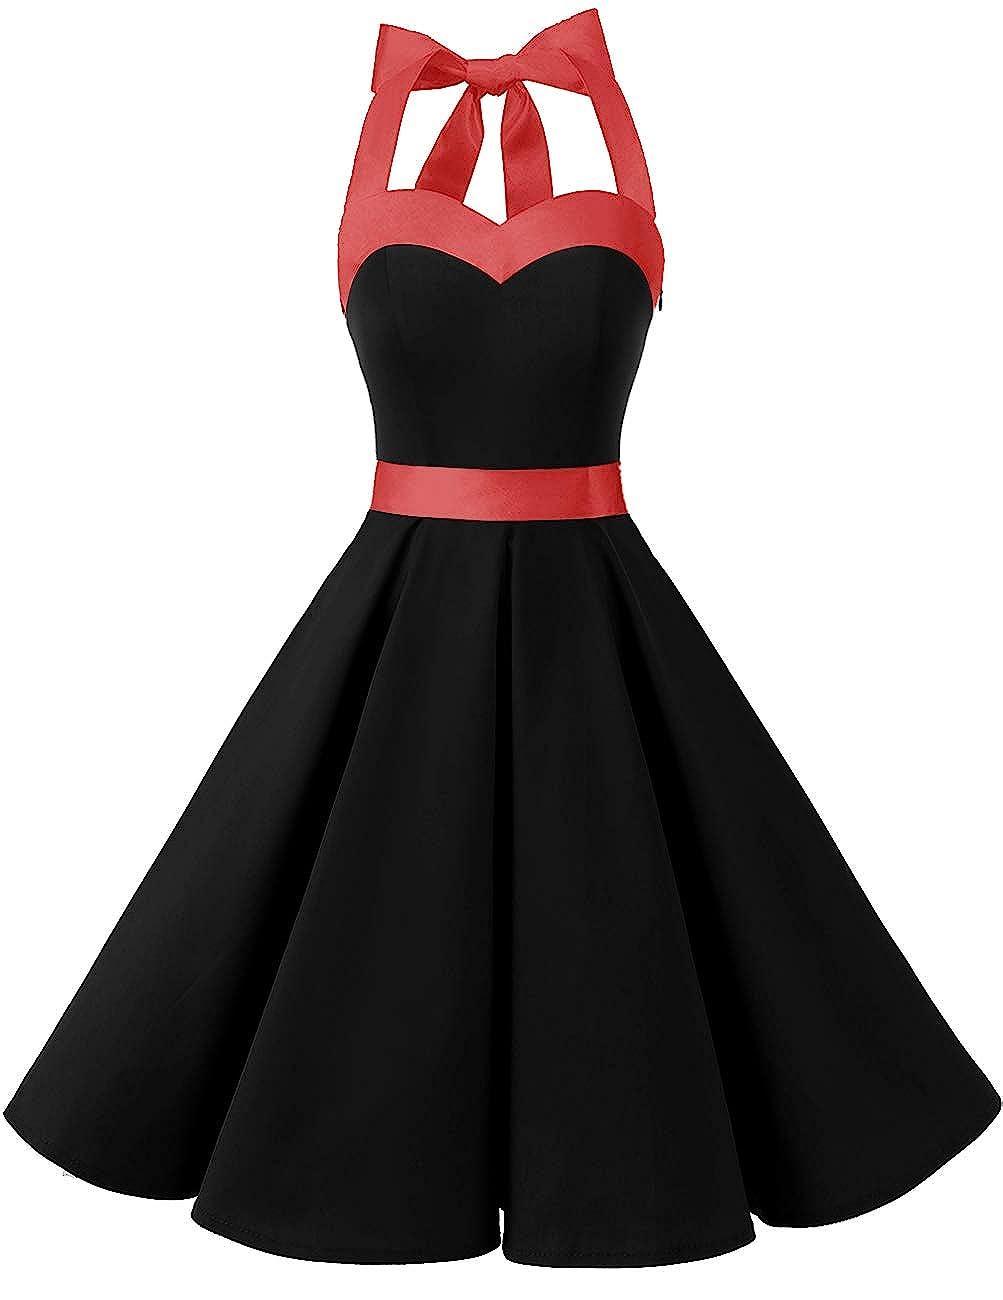 TALLA XL. Dresstells® Halter 50s Rockabilly Polka Dots Audrey Dress Retro Cocktail Dress Royal Blue Flower XL